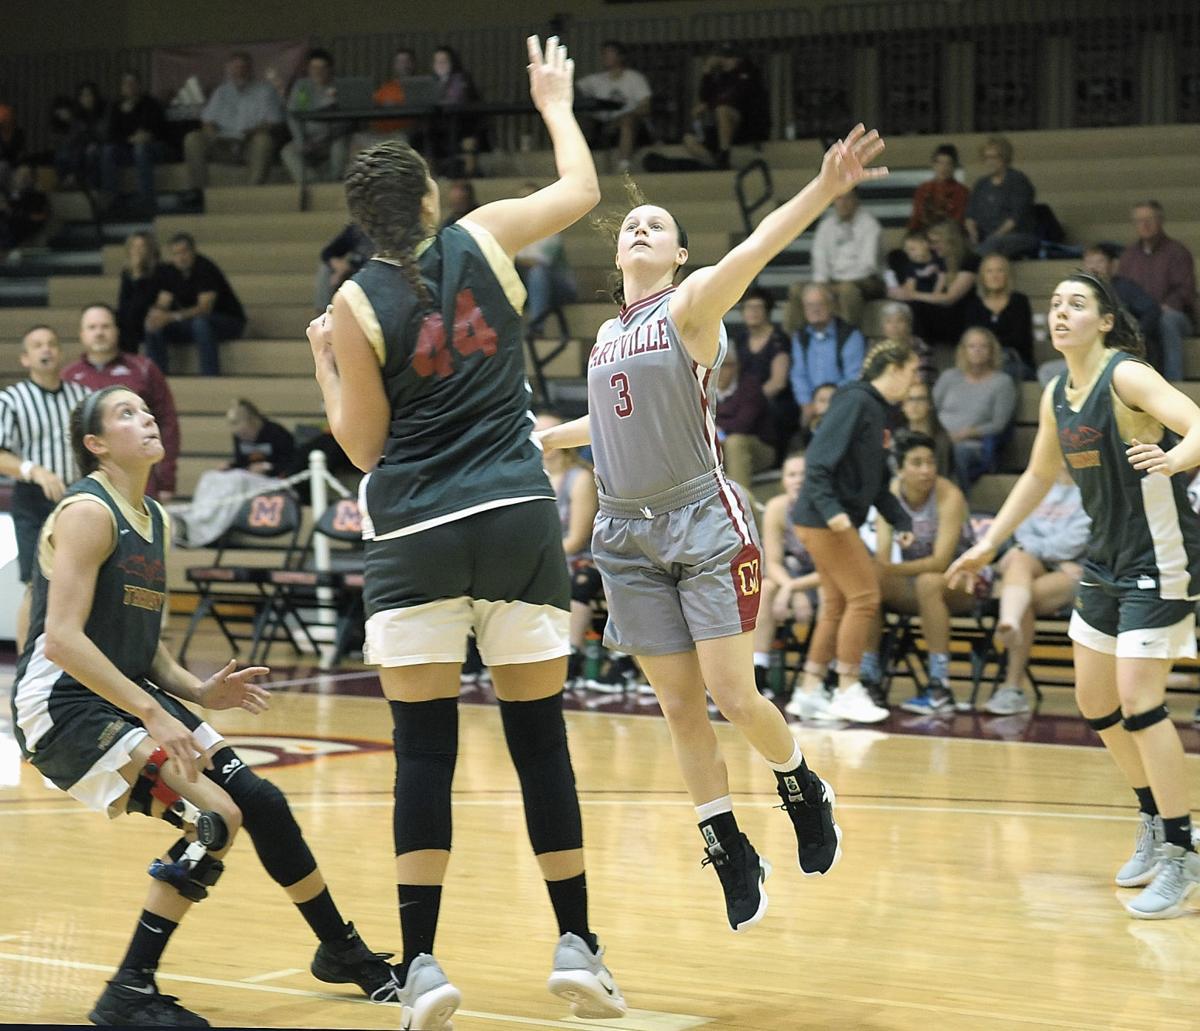 BASKETBALL: Maryville College's Libby Gardner vs Transylvania